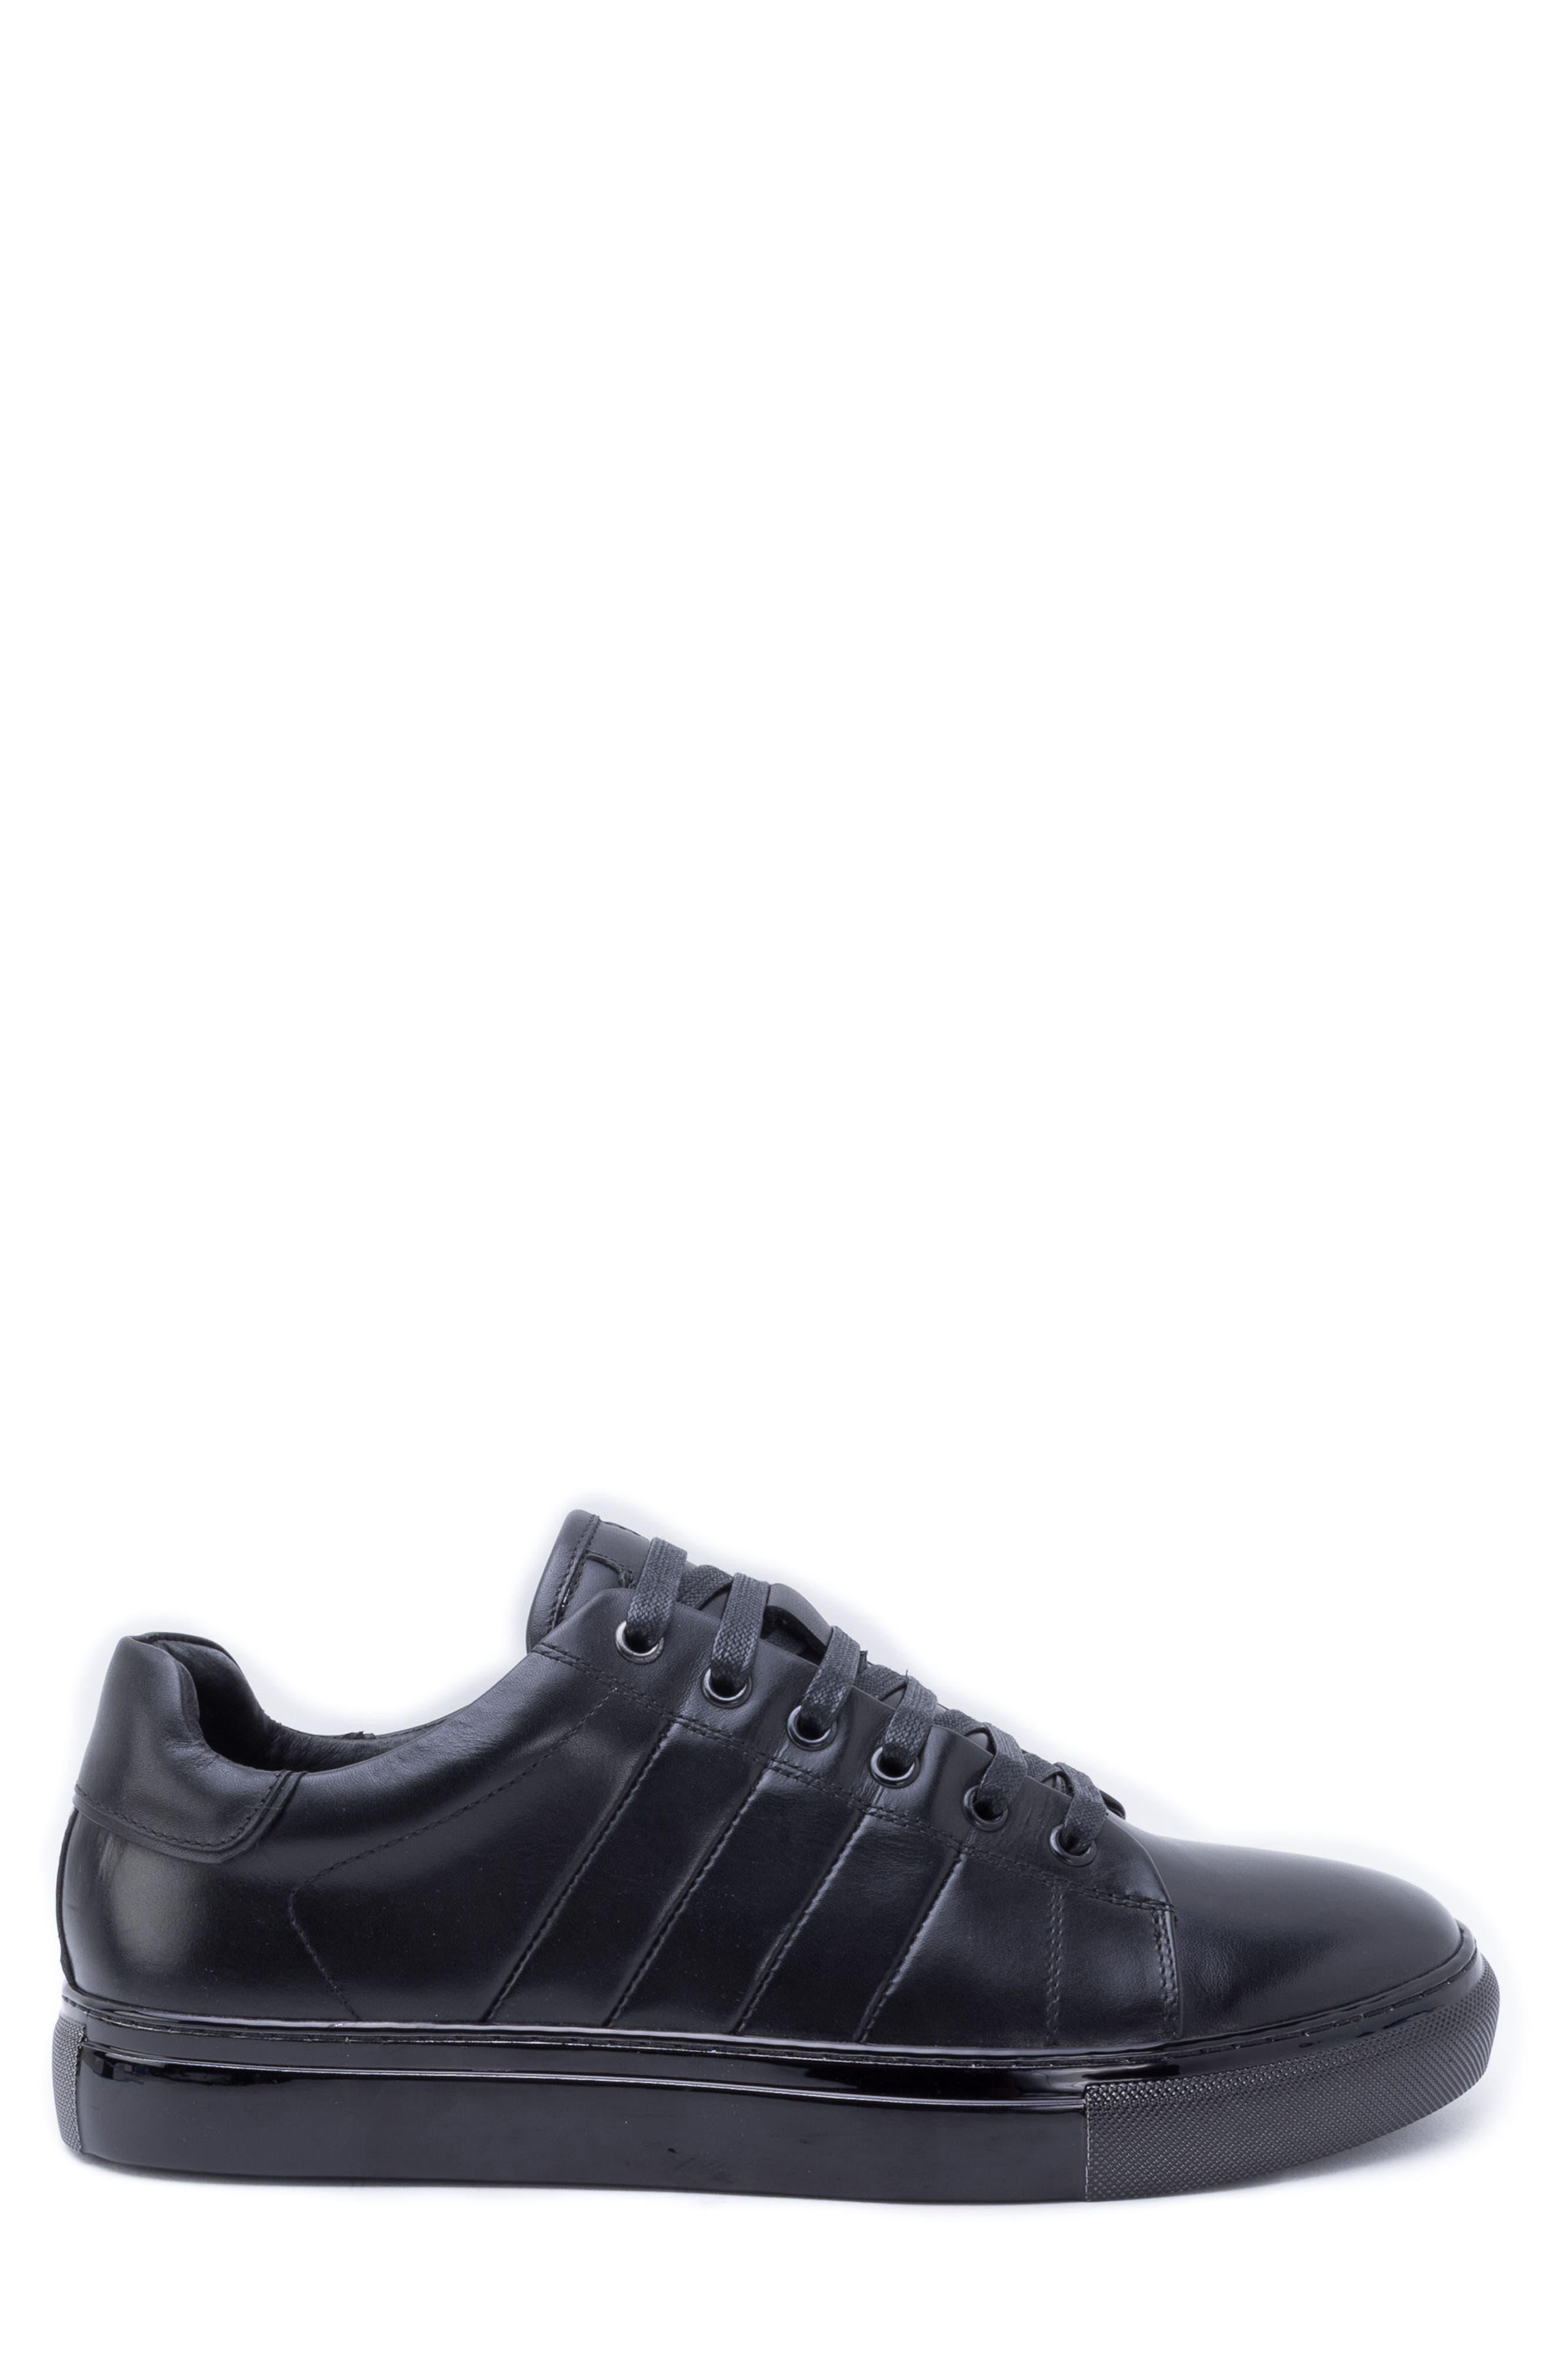 Hackman Sneaker,                             Alternate thumbnail 3, color,                             BLACK LEATHER